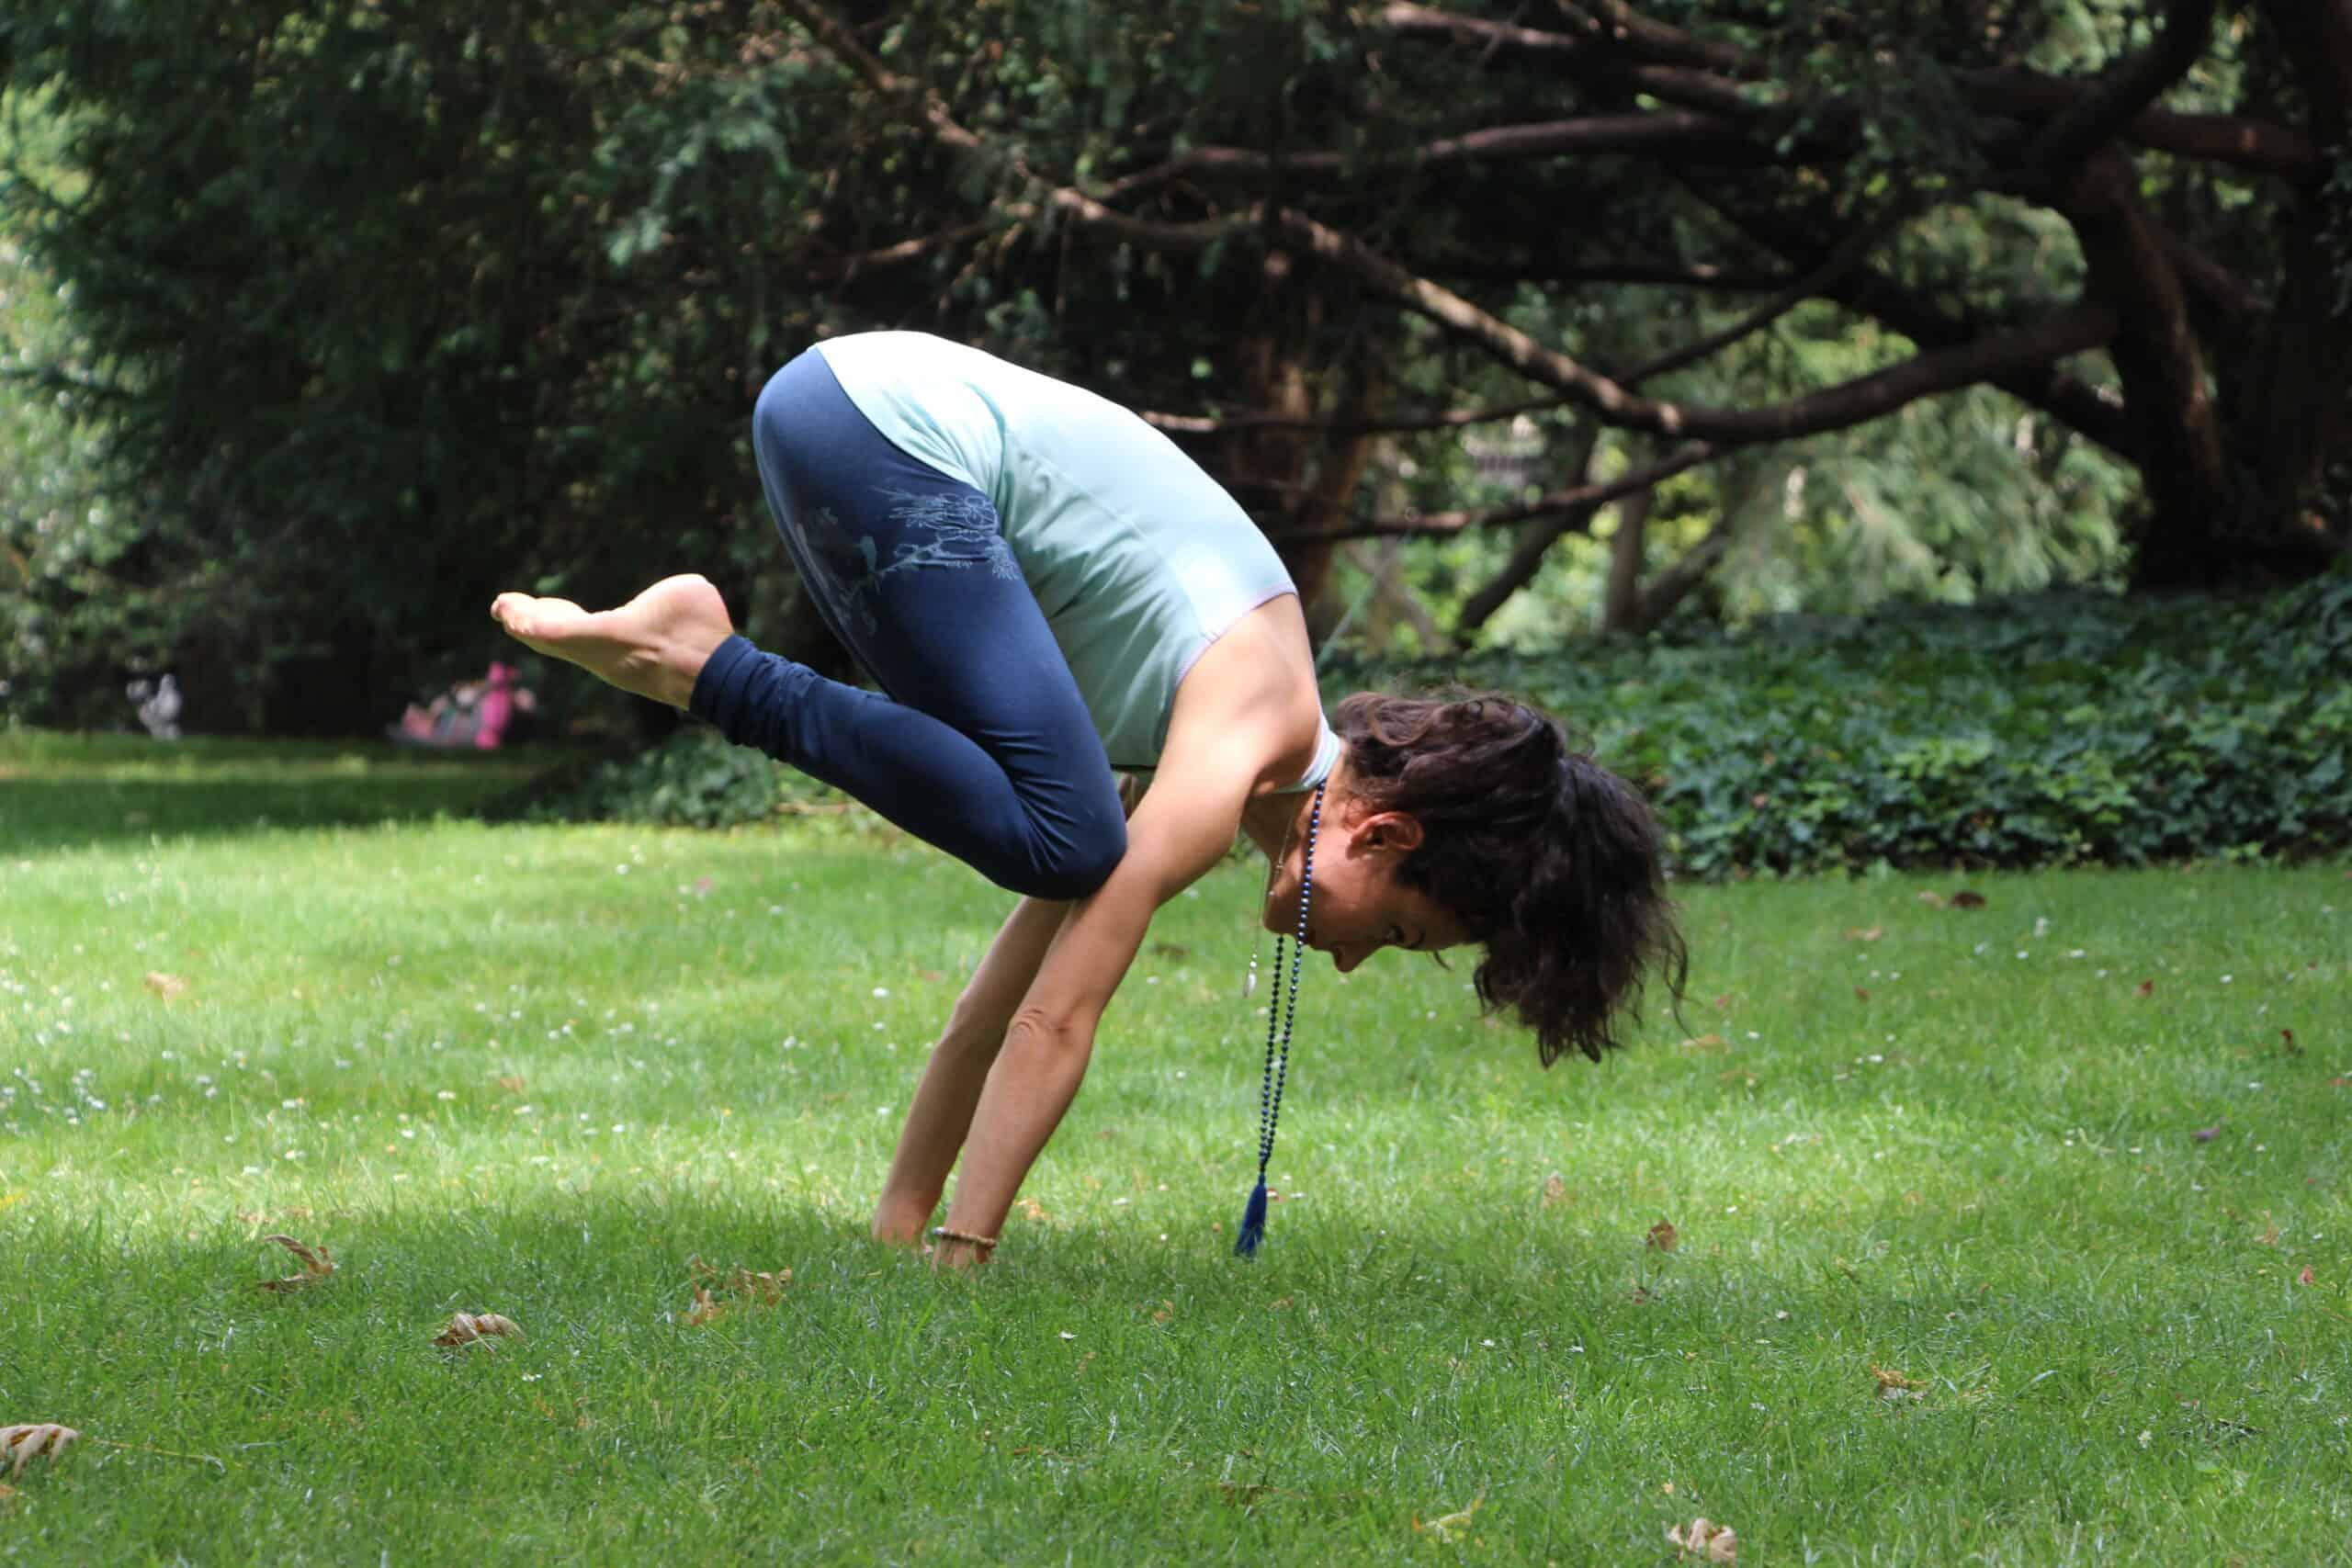 olivia charpentier en bakasana posture de la première série d'Ashtanga Yoga